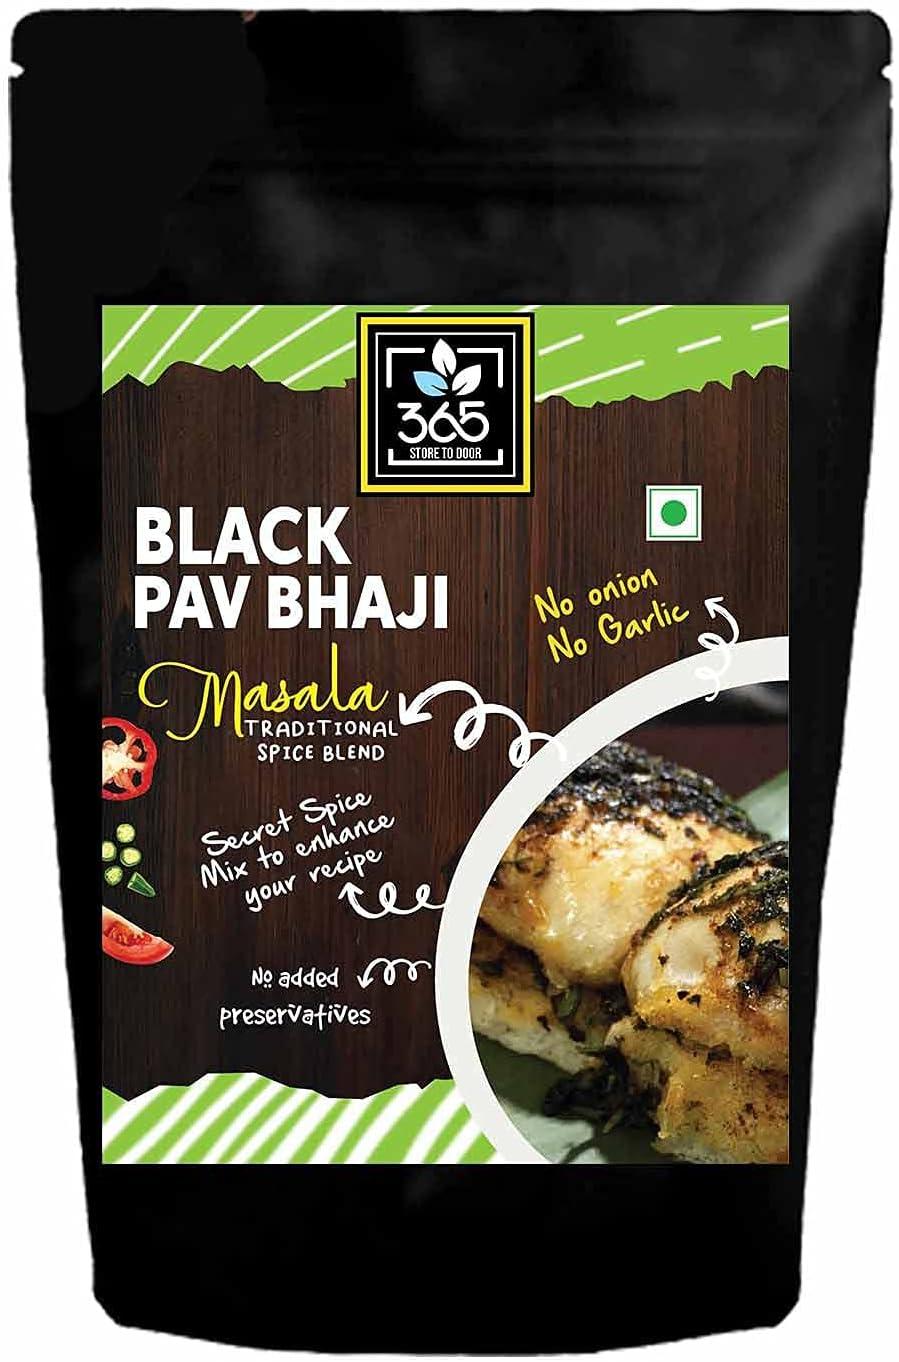 Bluenile 365 STORE TO DOOR Indian Spice Popular shop is the lowest Reservation price challenge M Jain - Bhaji Black Pav